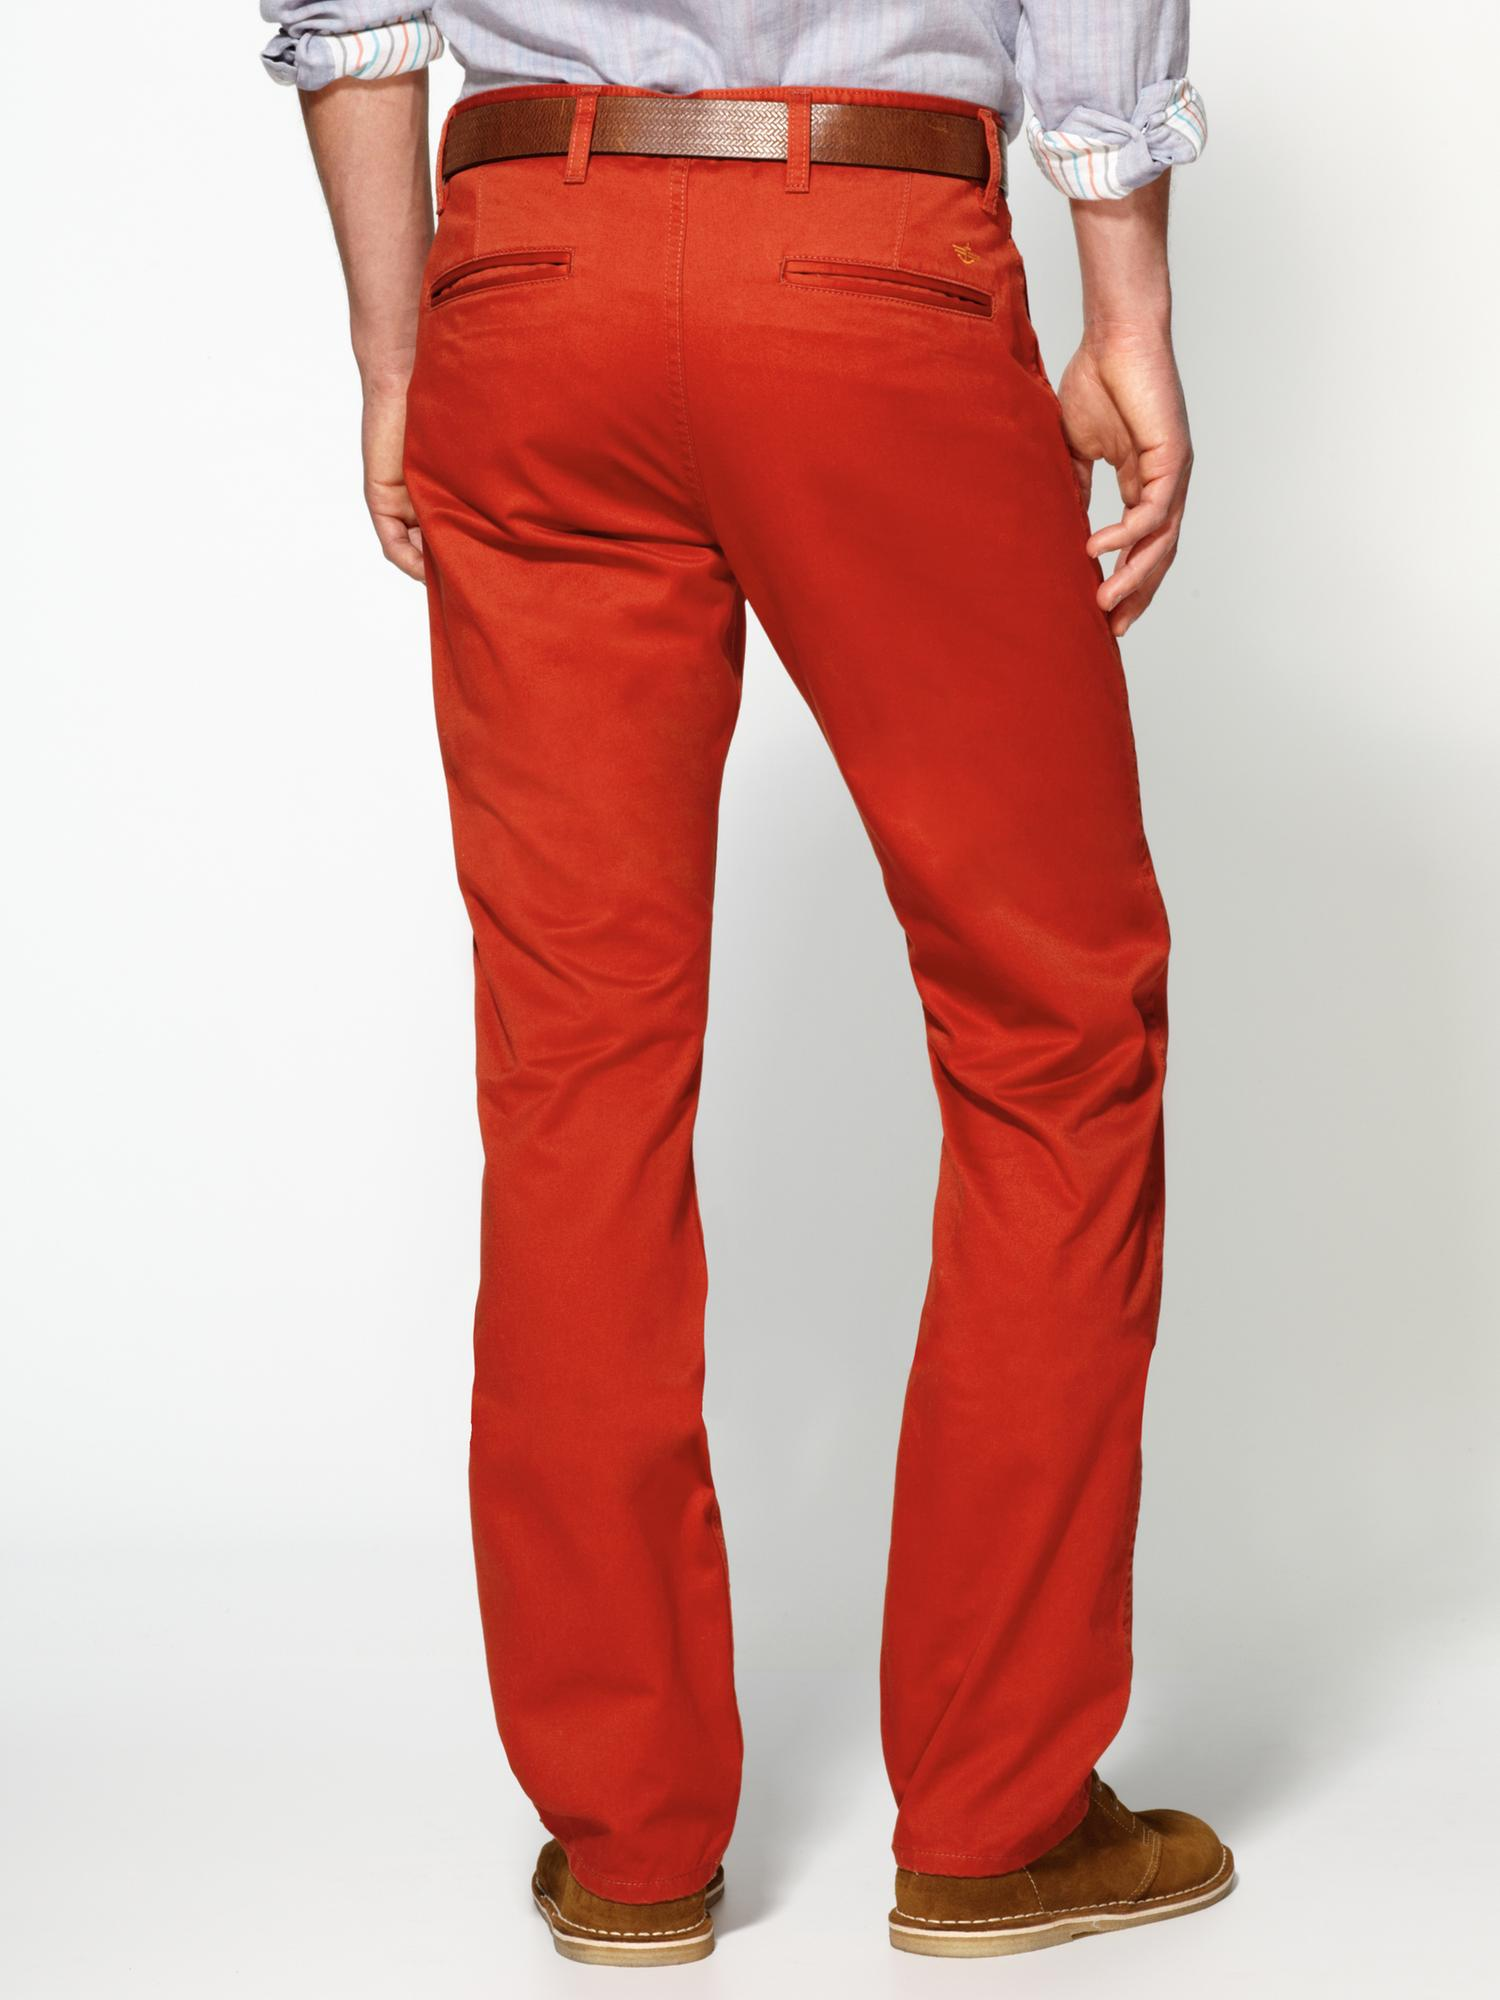 Red Khaki Pants For Men   Gpant